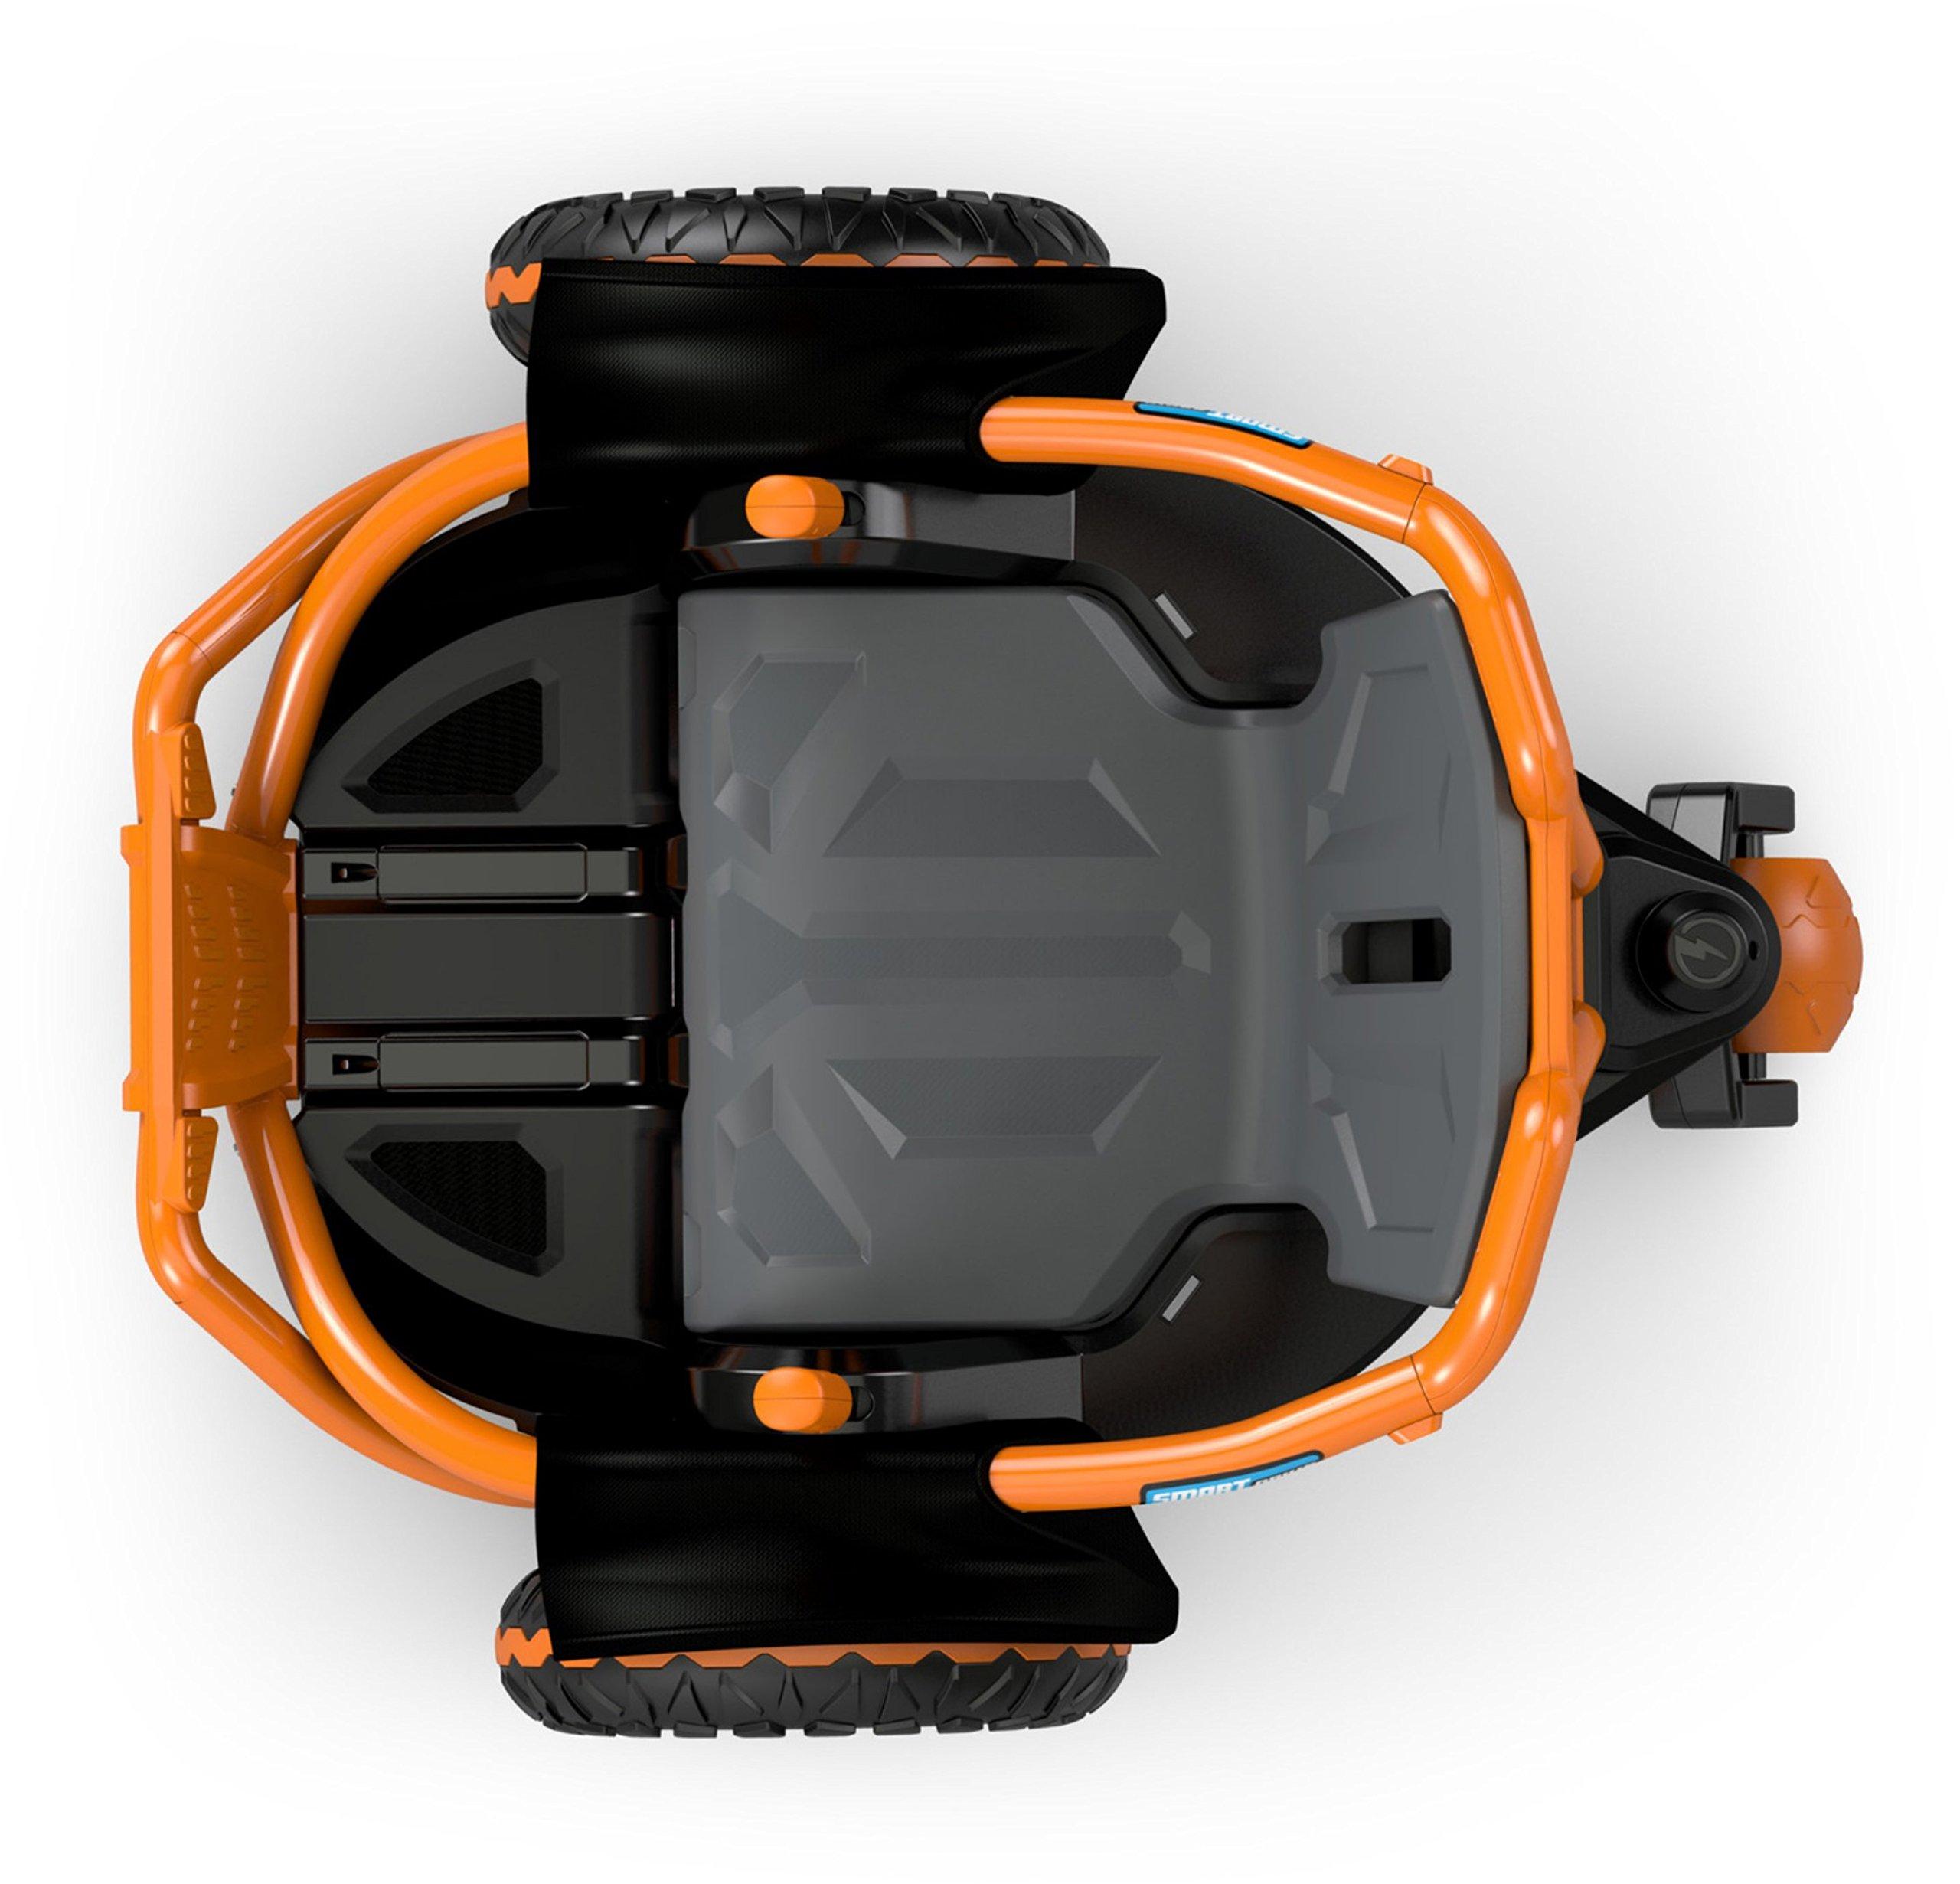 Power Wheels Wild Thing, Orange by Power Wheels (Image #8)